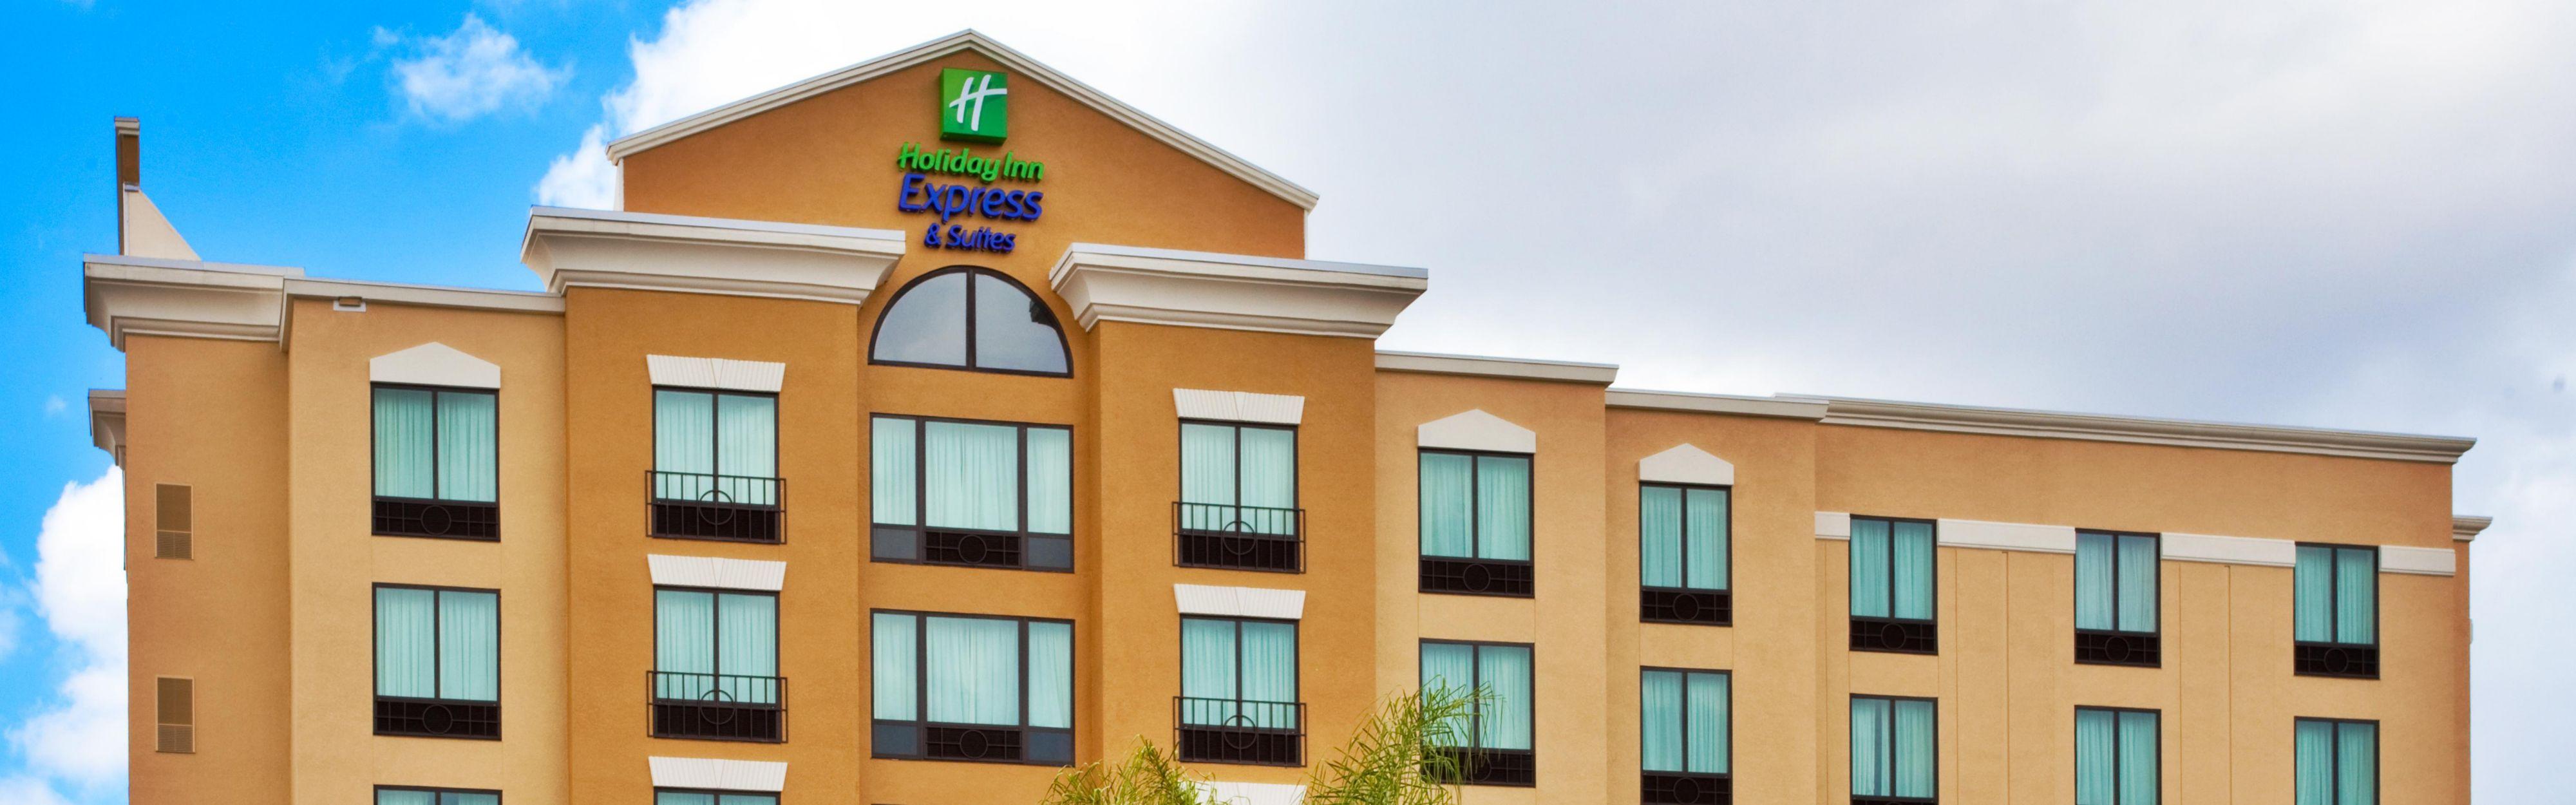 Holiday Inn Express & Suites Orlando - International Drive image 0